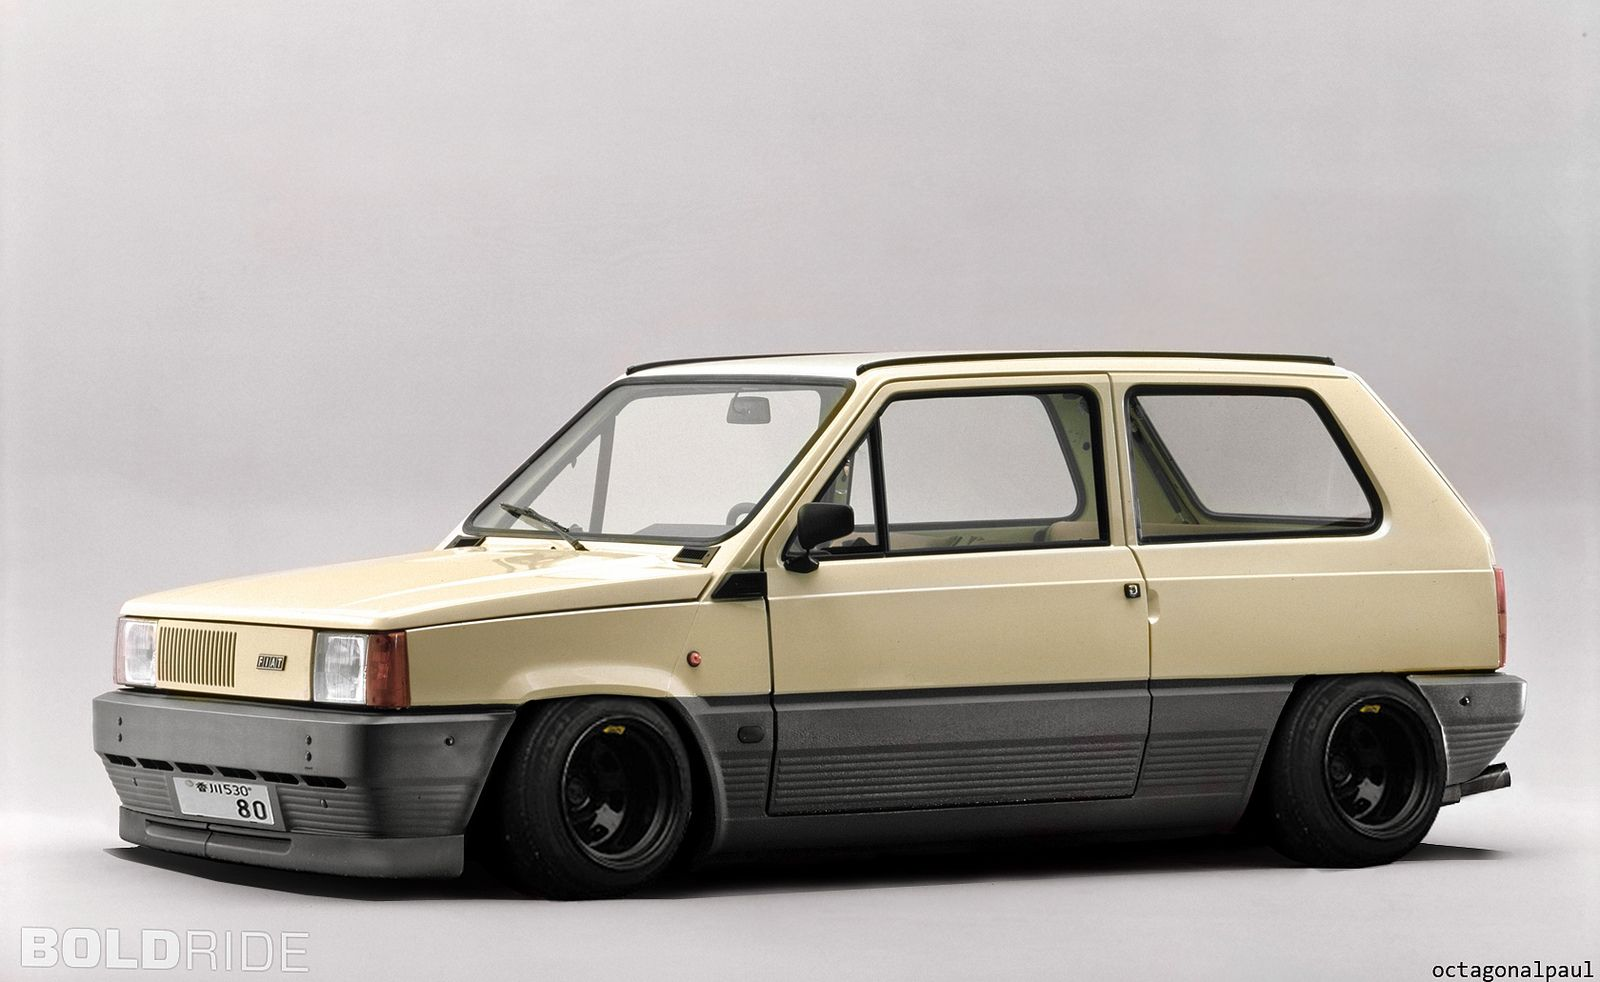 Fiat Panda Mk1 With Images Fiat Panda Fiat Cars Fiat